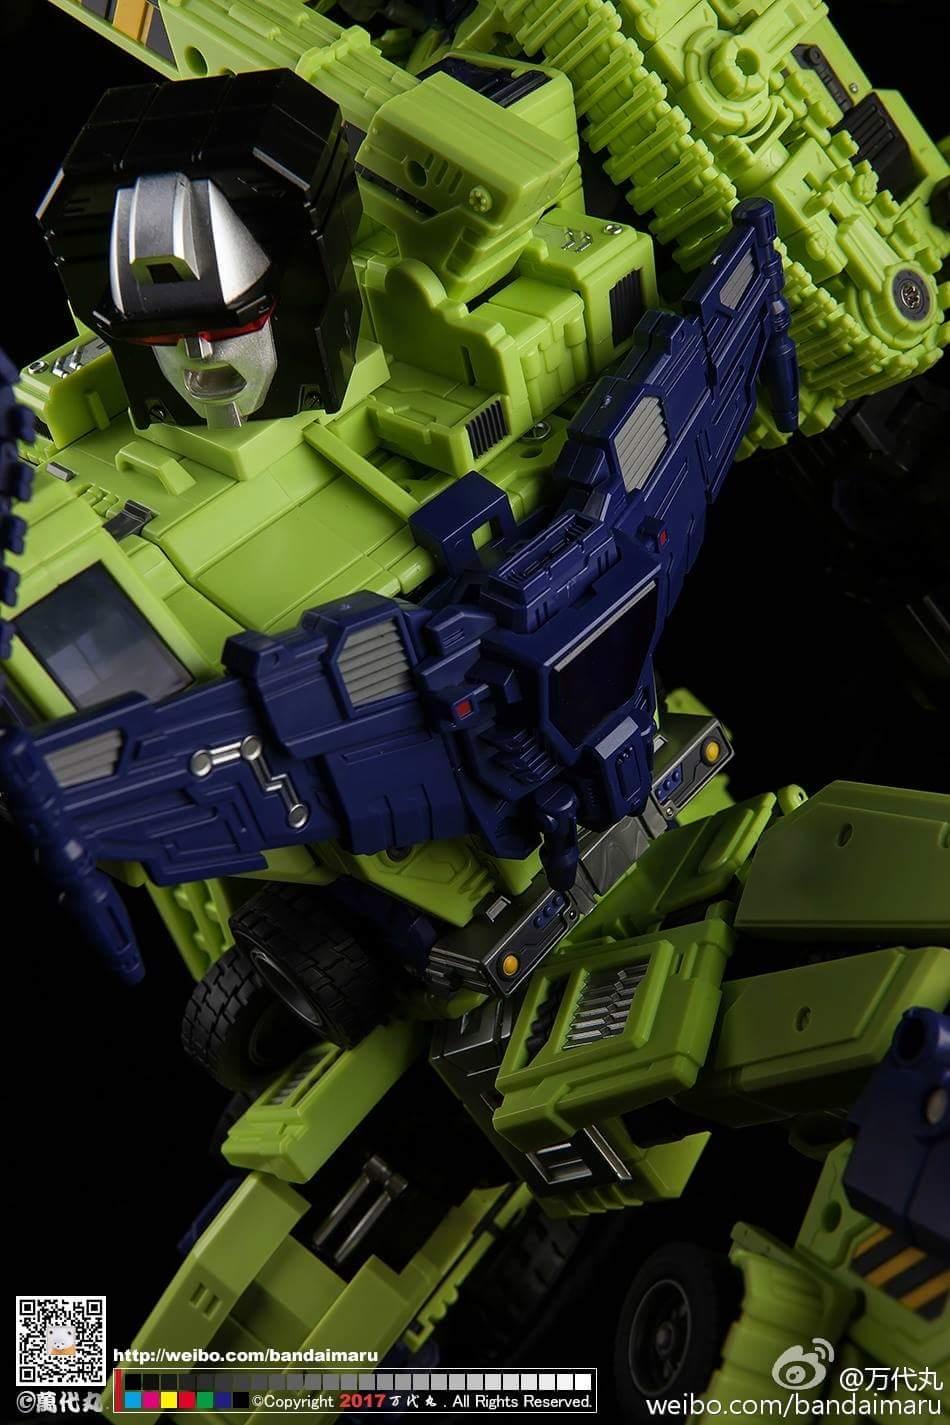 [Toyworld] Produit Tiers - Jouet TW-C Constructor aka Devastator/Dévastateur (Version vert G1 et jaune G2) - Page 9 WBczJK7x